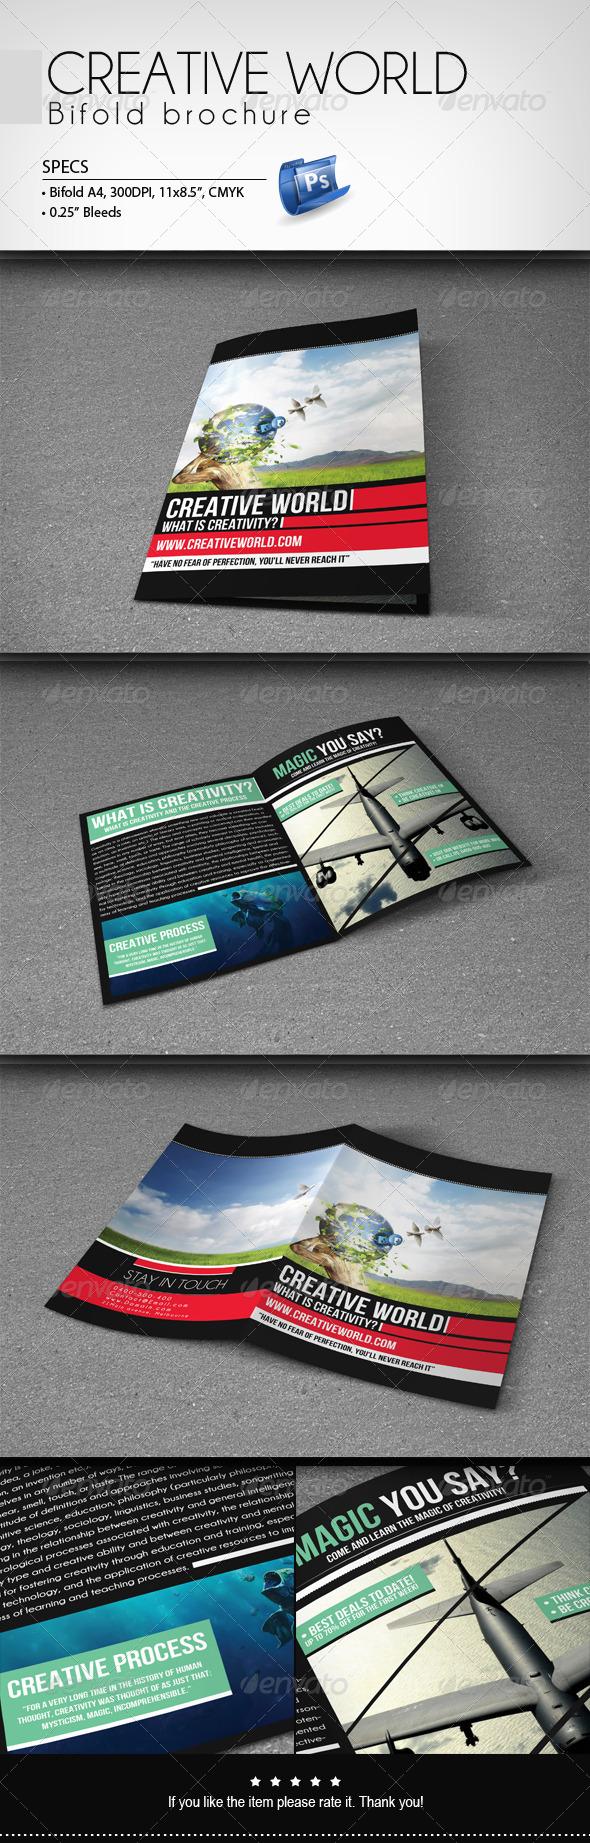 GraphicRiver Creative World Bifold Brochure 7872342